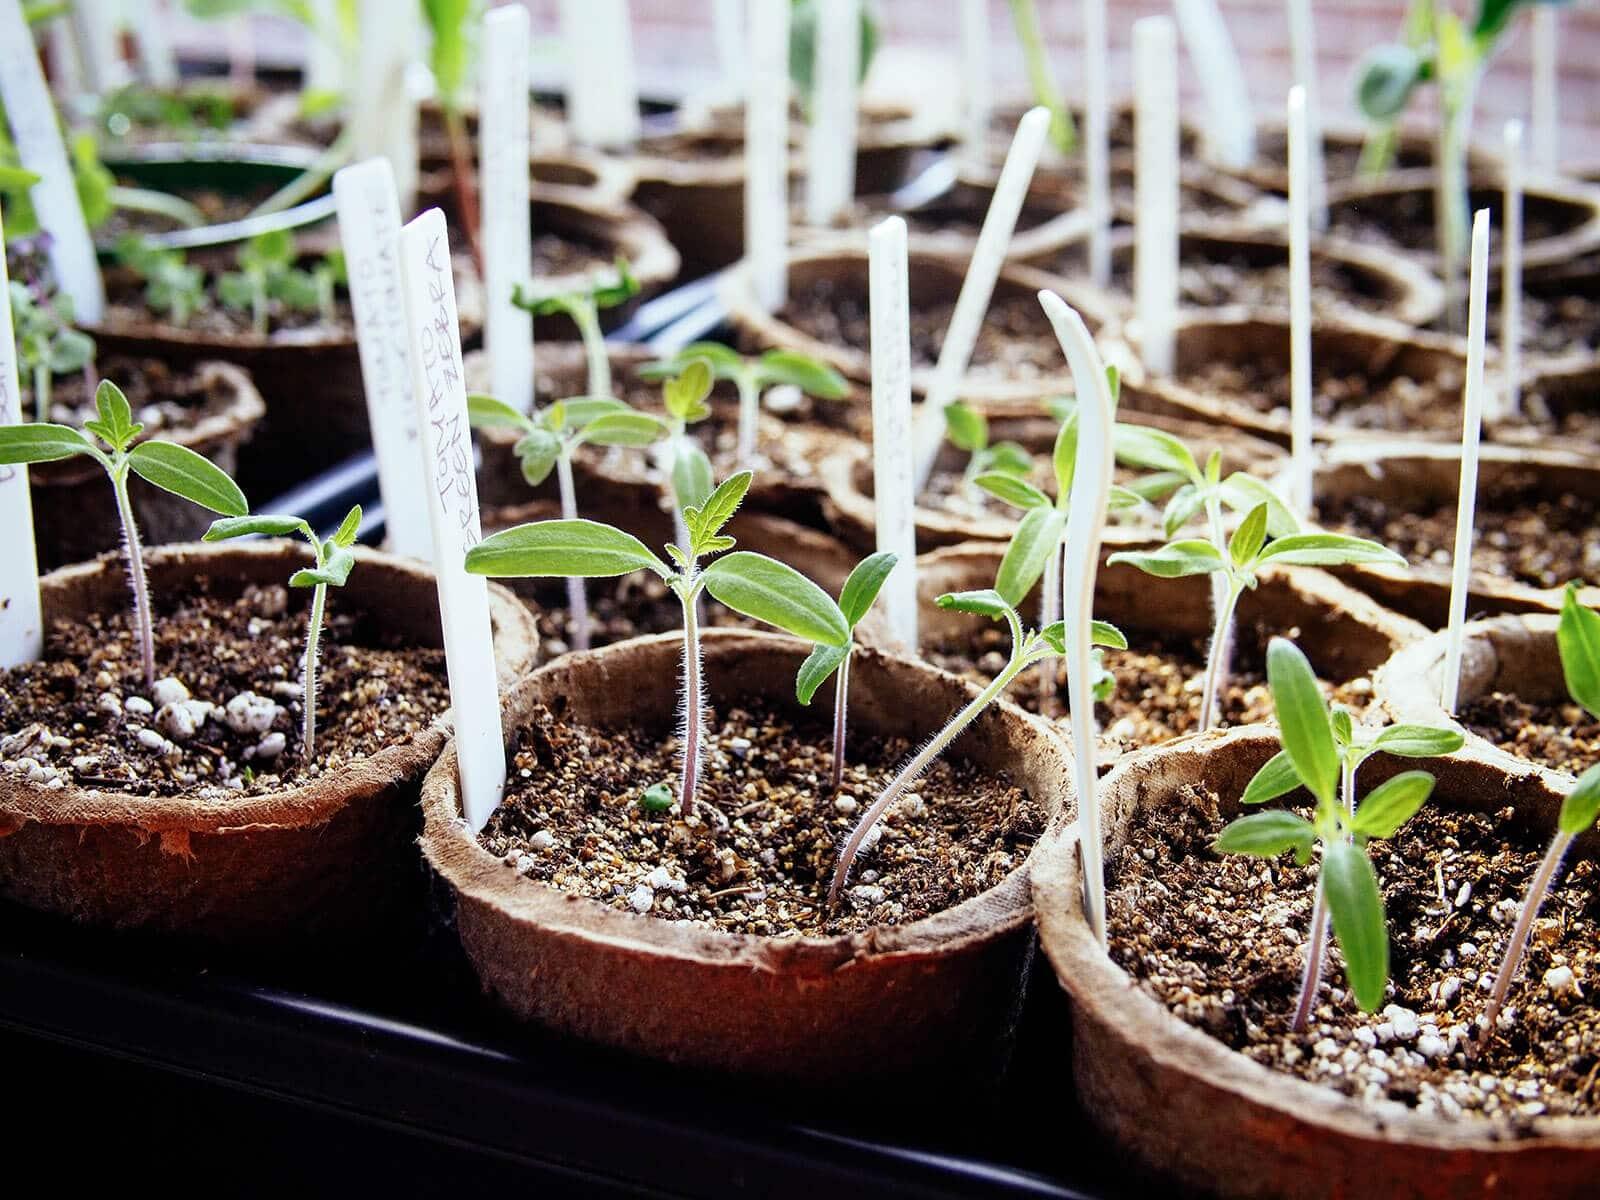 New tomato seedings with cotyledons